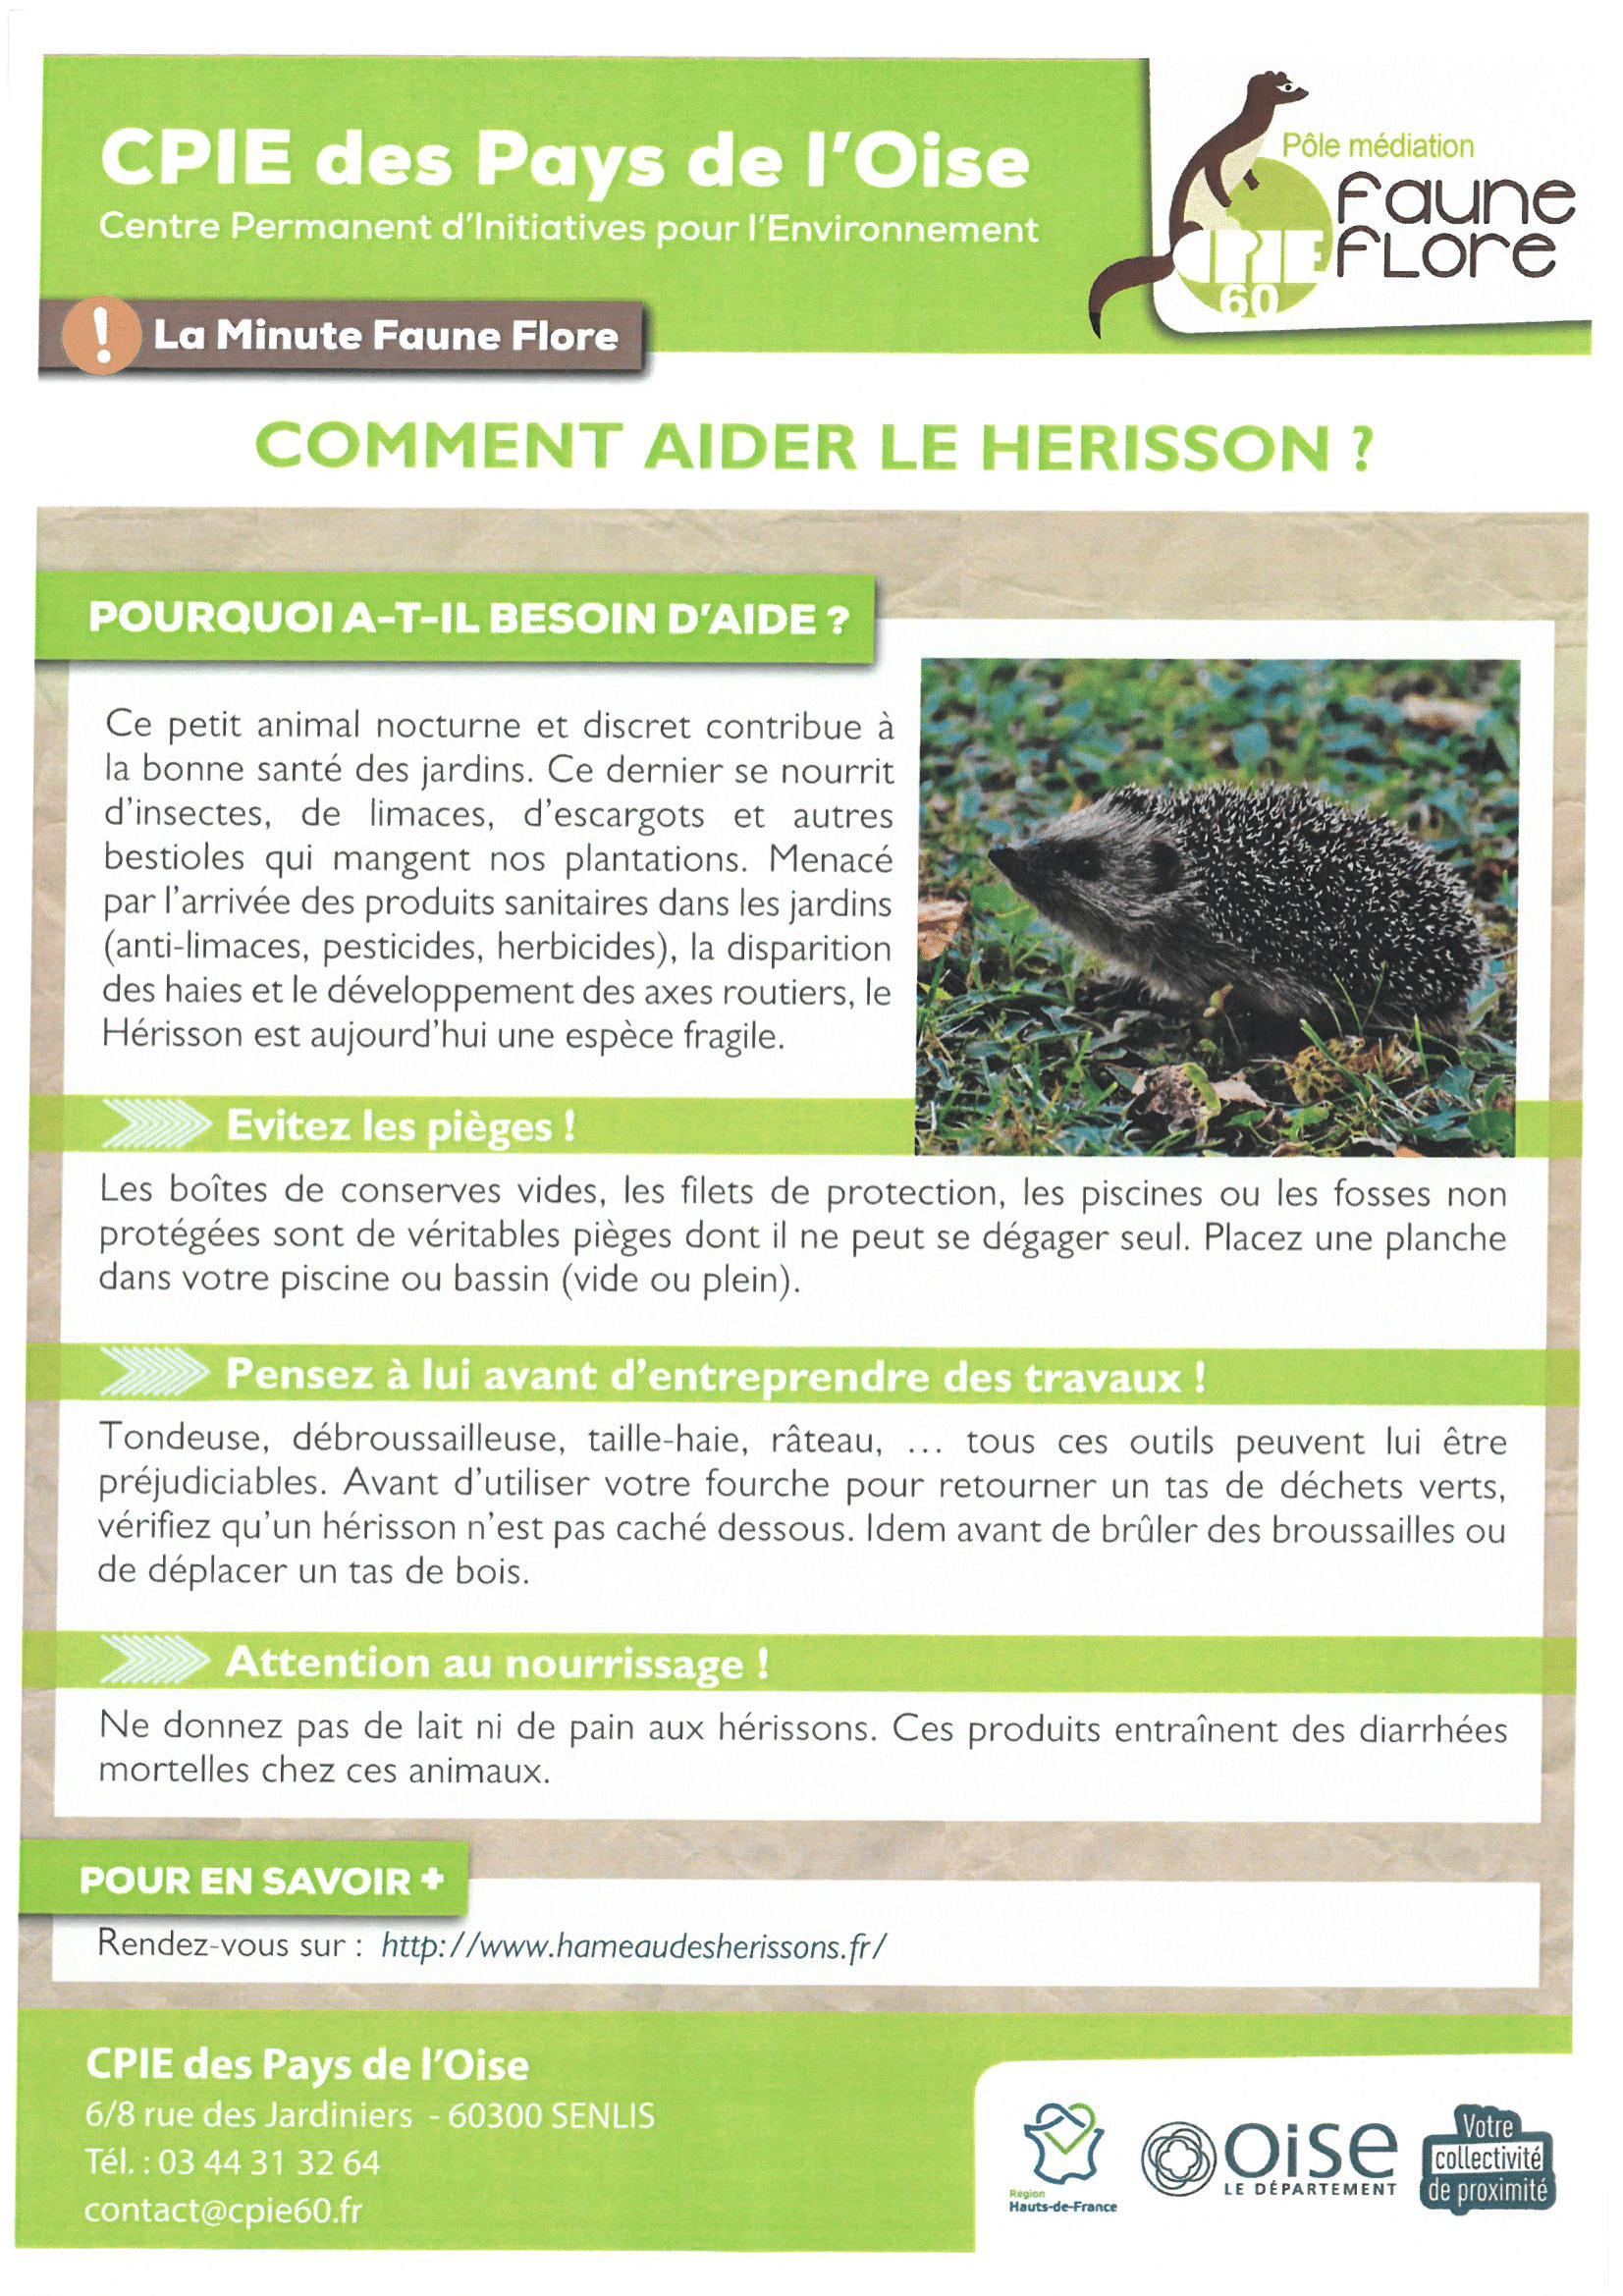 CPIE le herisson-1.png